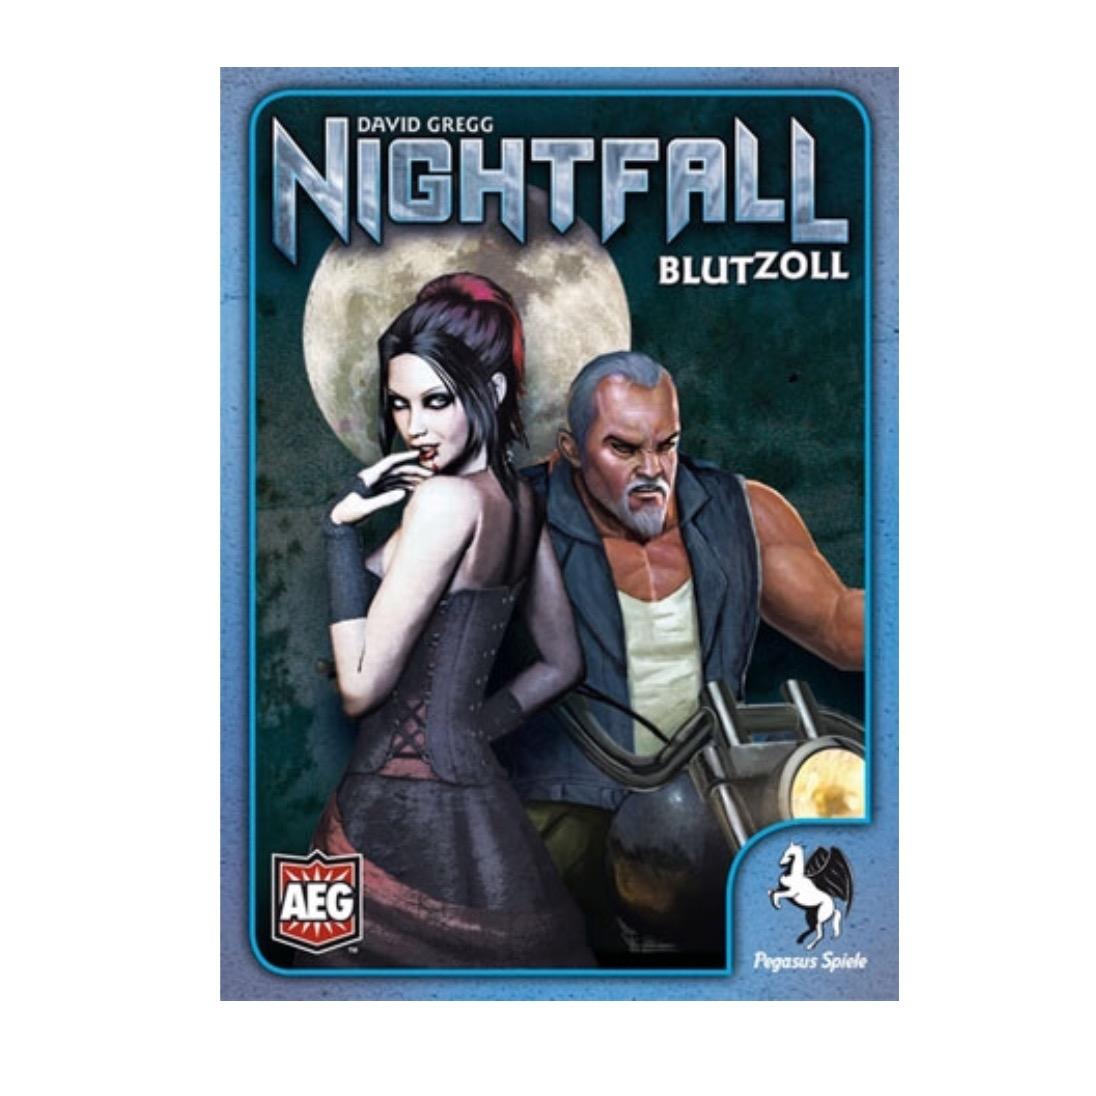 Nightfall Blutzoll für 2,89€ inkl. VSK (statt 12,99€) [spiele-offensive.de]